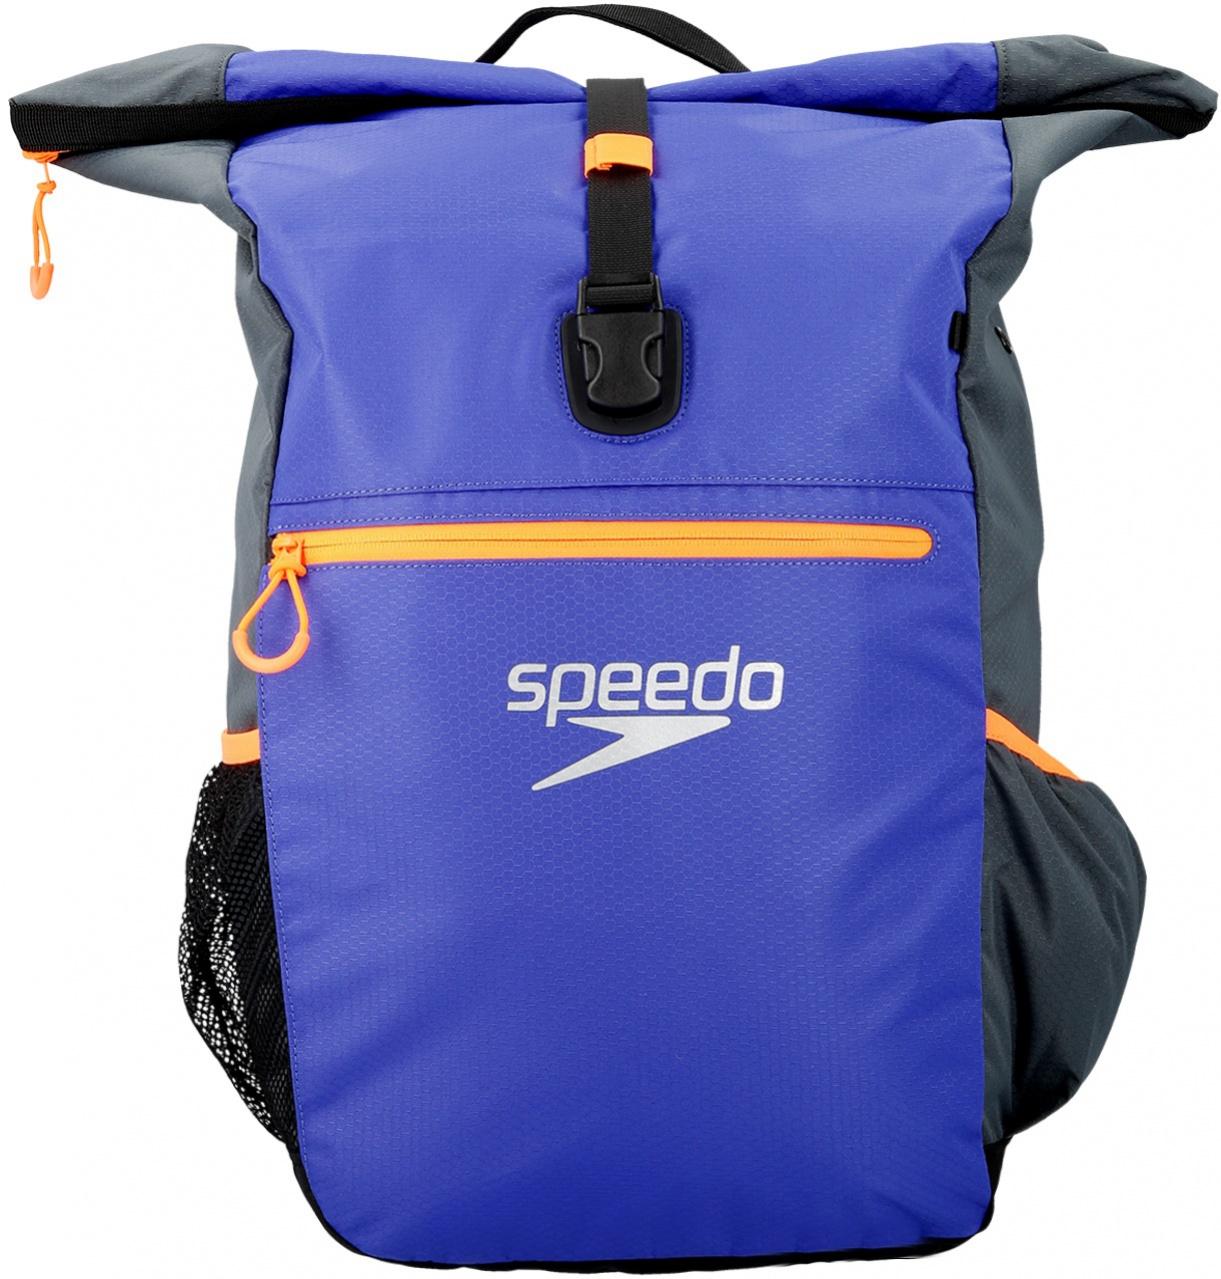 Hátizsák speedo team rucksack iii 30 liter kék GLAMI.hu